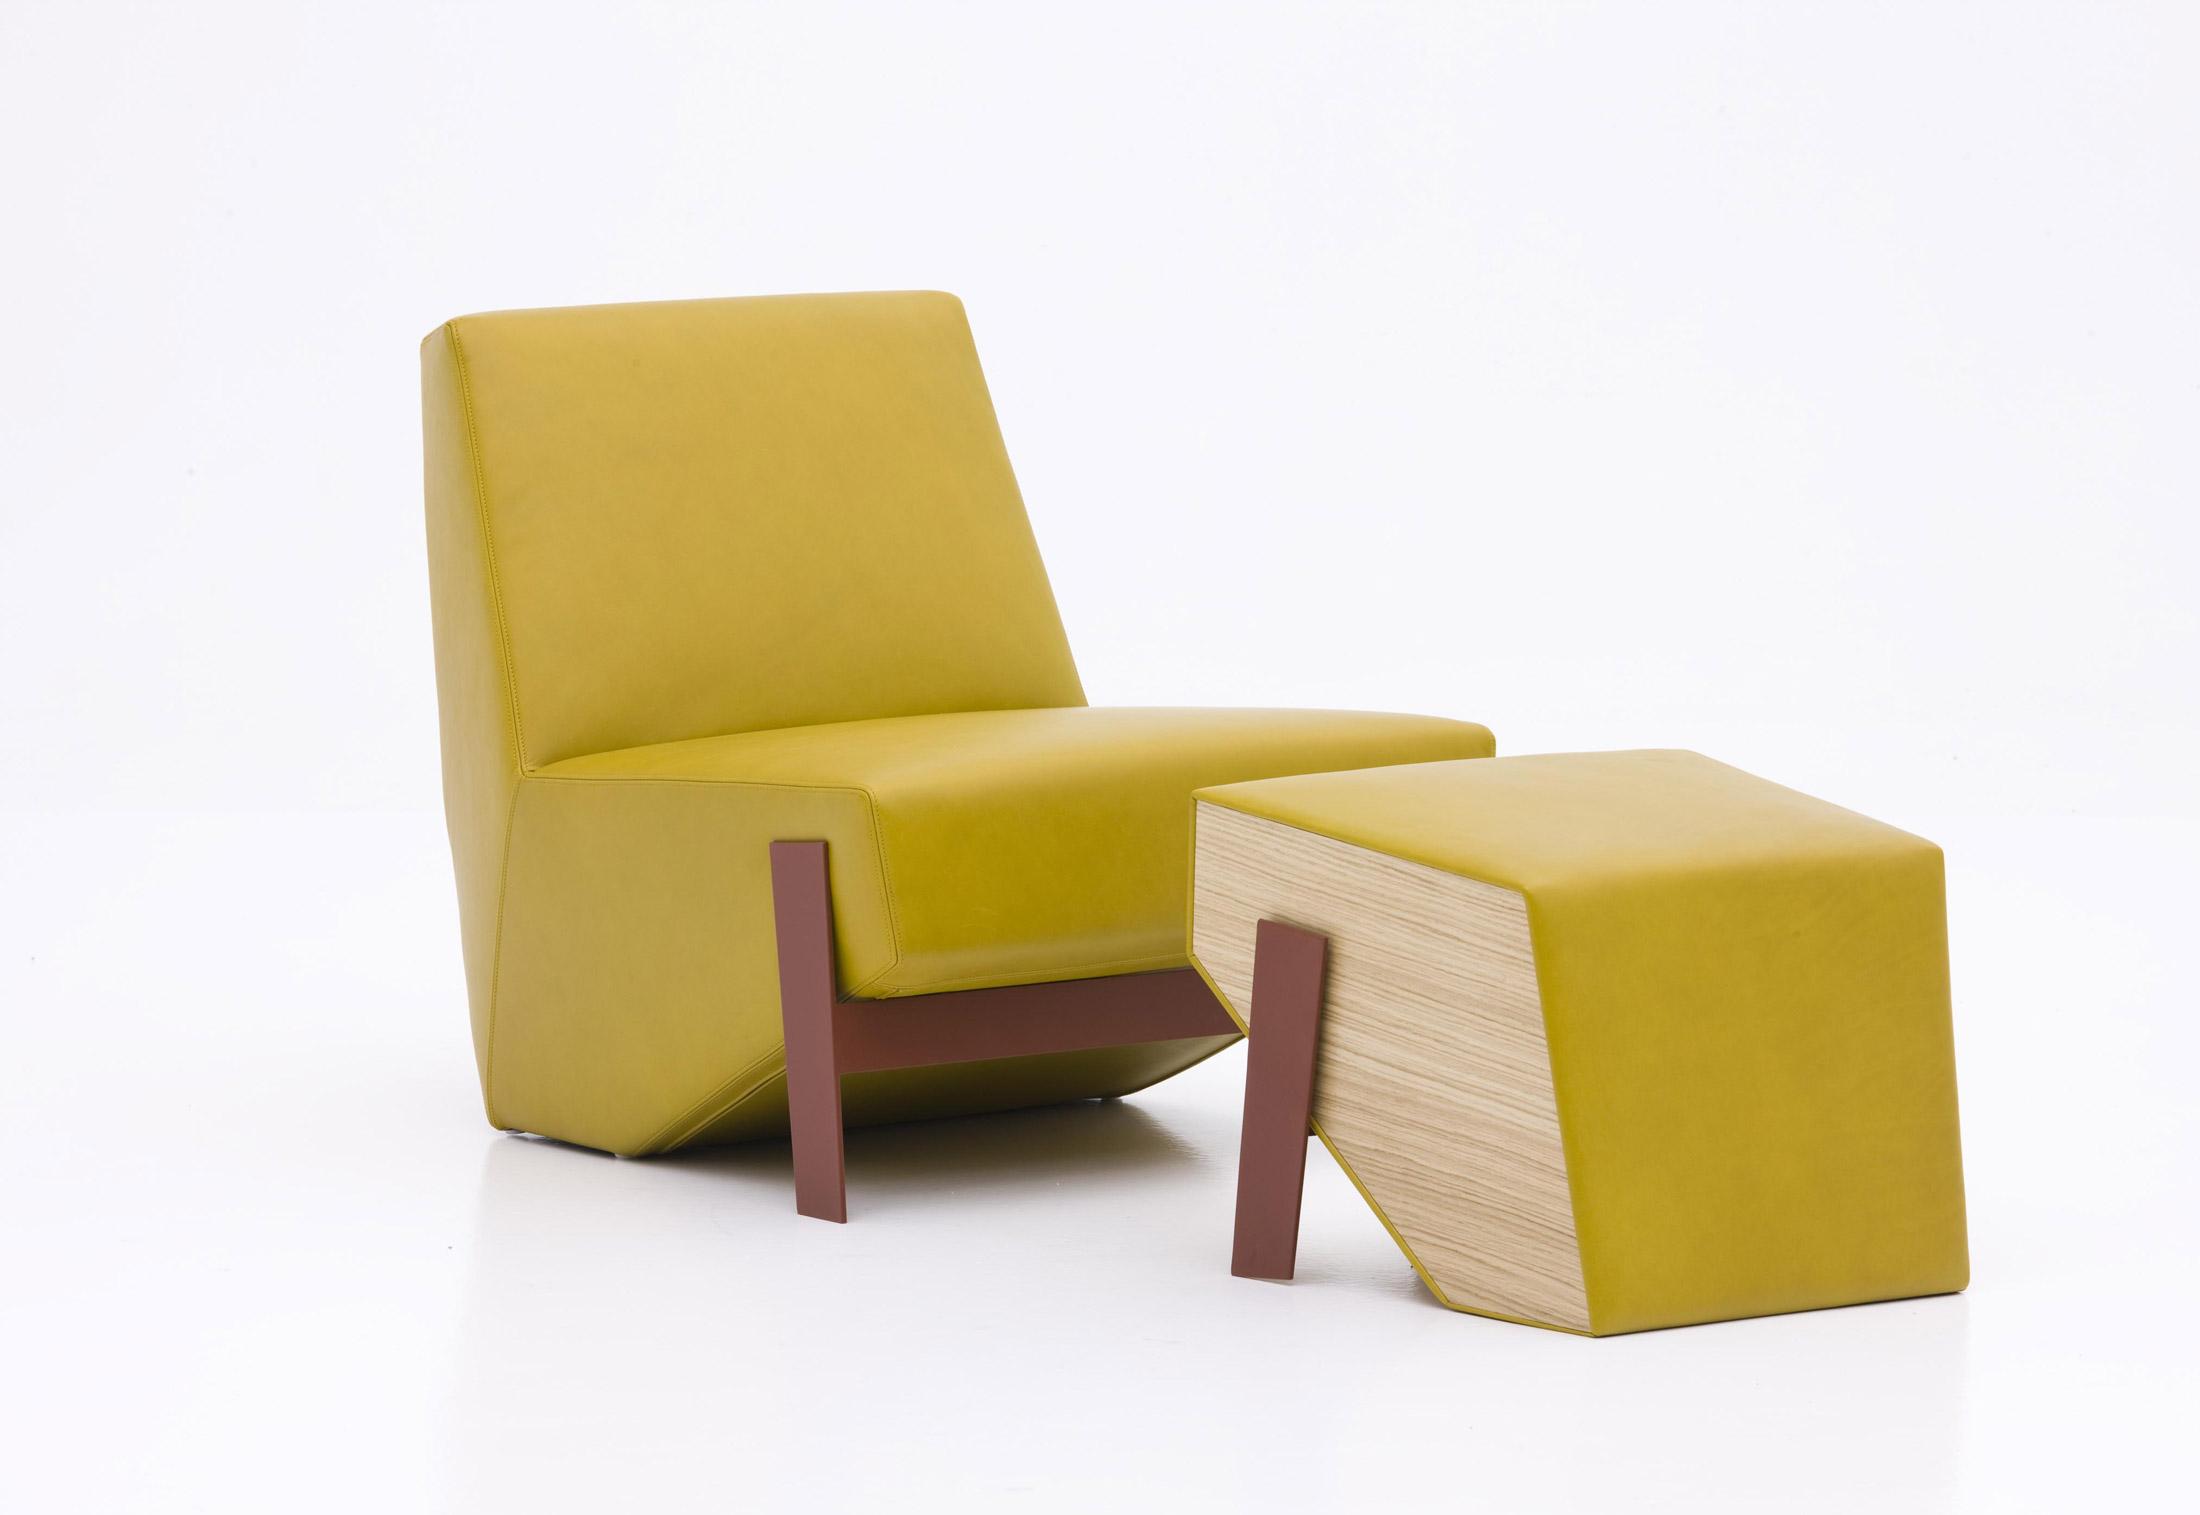 Silver lake armchair di moroso poltrone chaise longue for Poltrone moroso prezzi